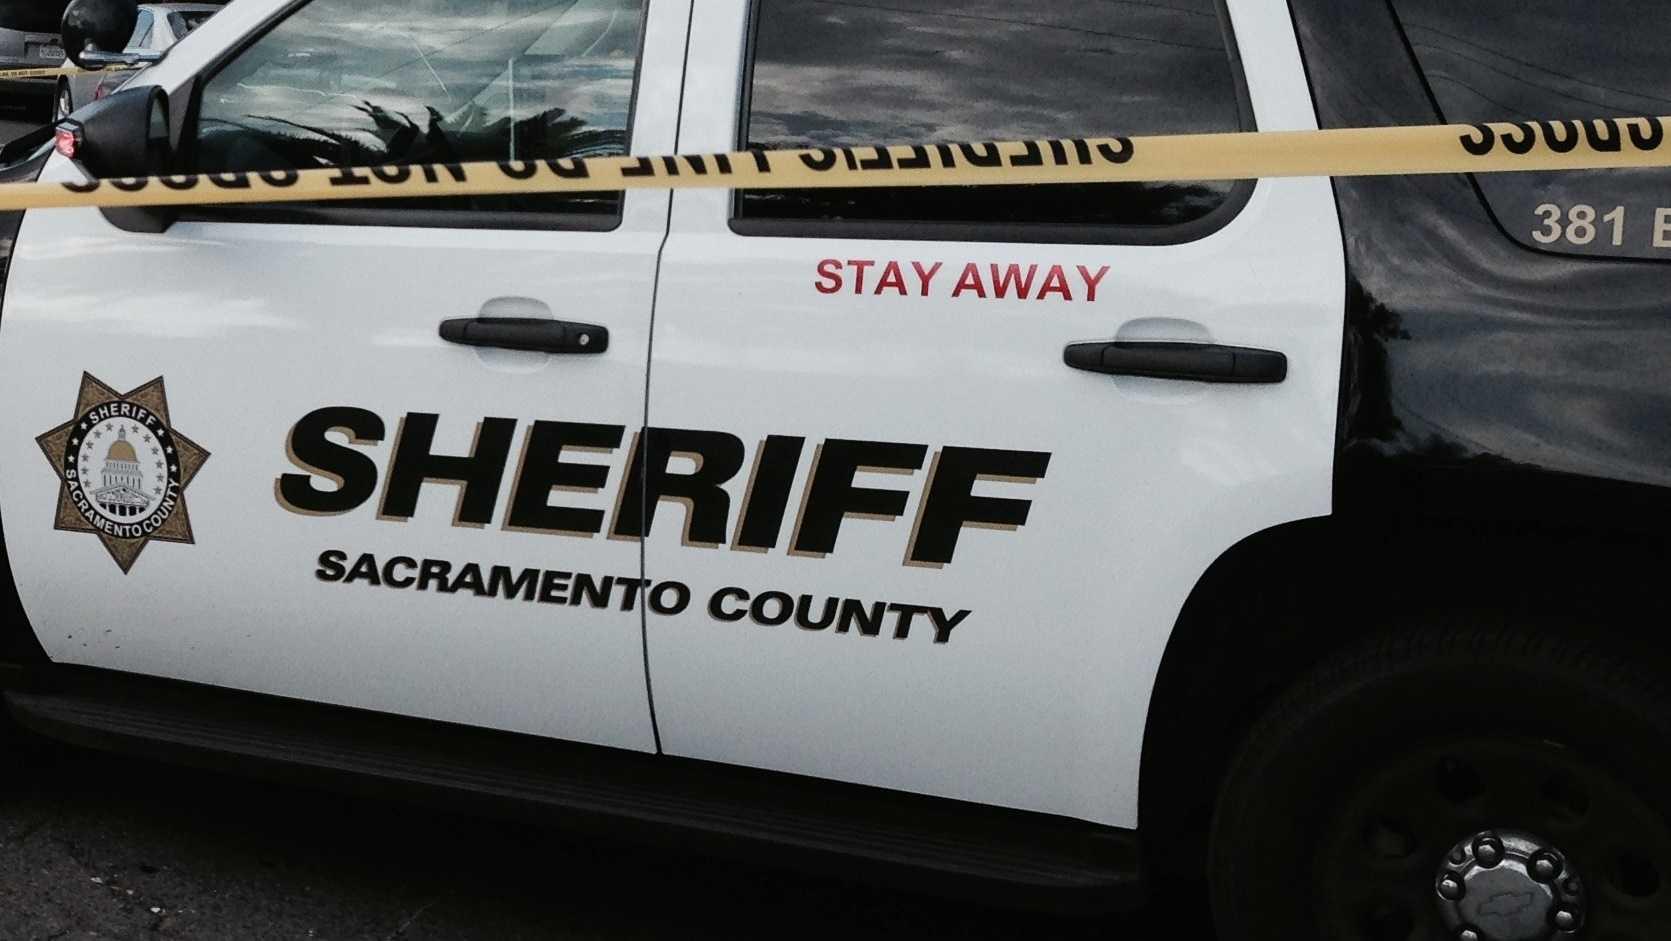 Sacramento County Sheriff's Department